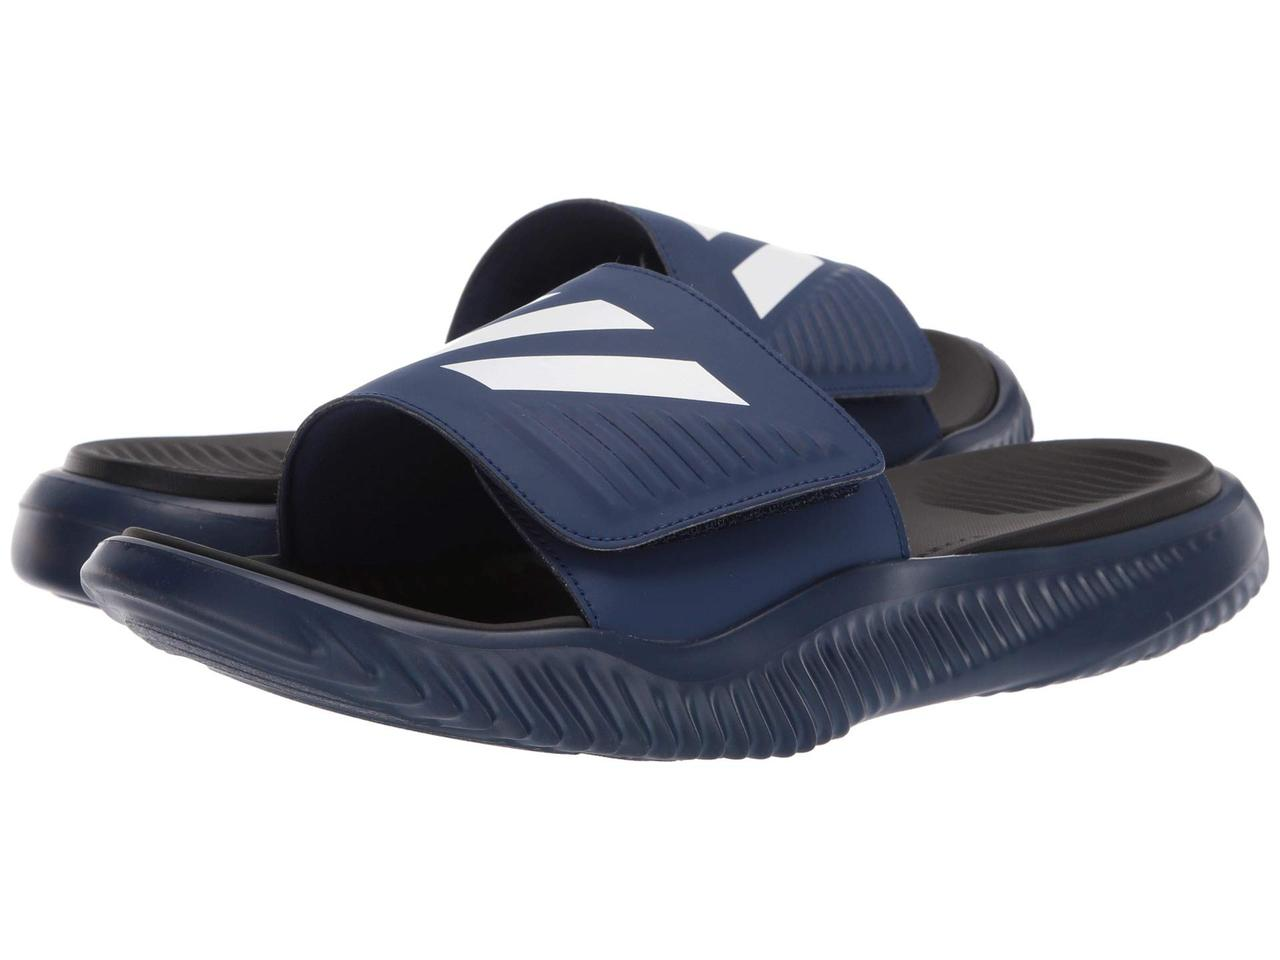 184a210a58f Сандали/Вьетнамки (Оригинал) adidas Alphabounce Basketball Slides Dark  Blue/Footwear White/Core Black